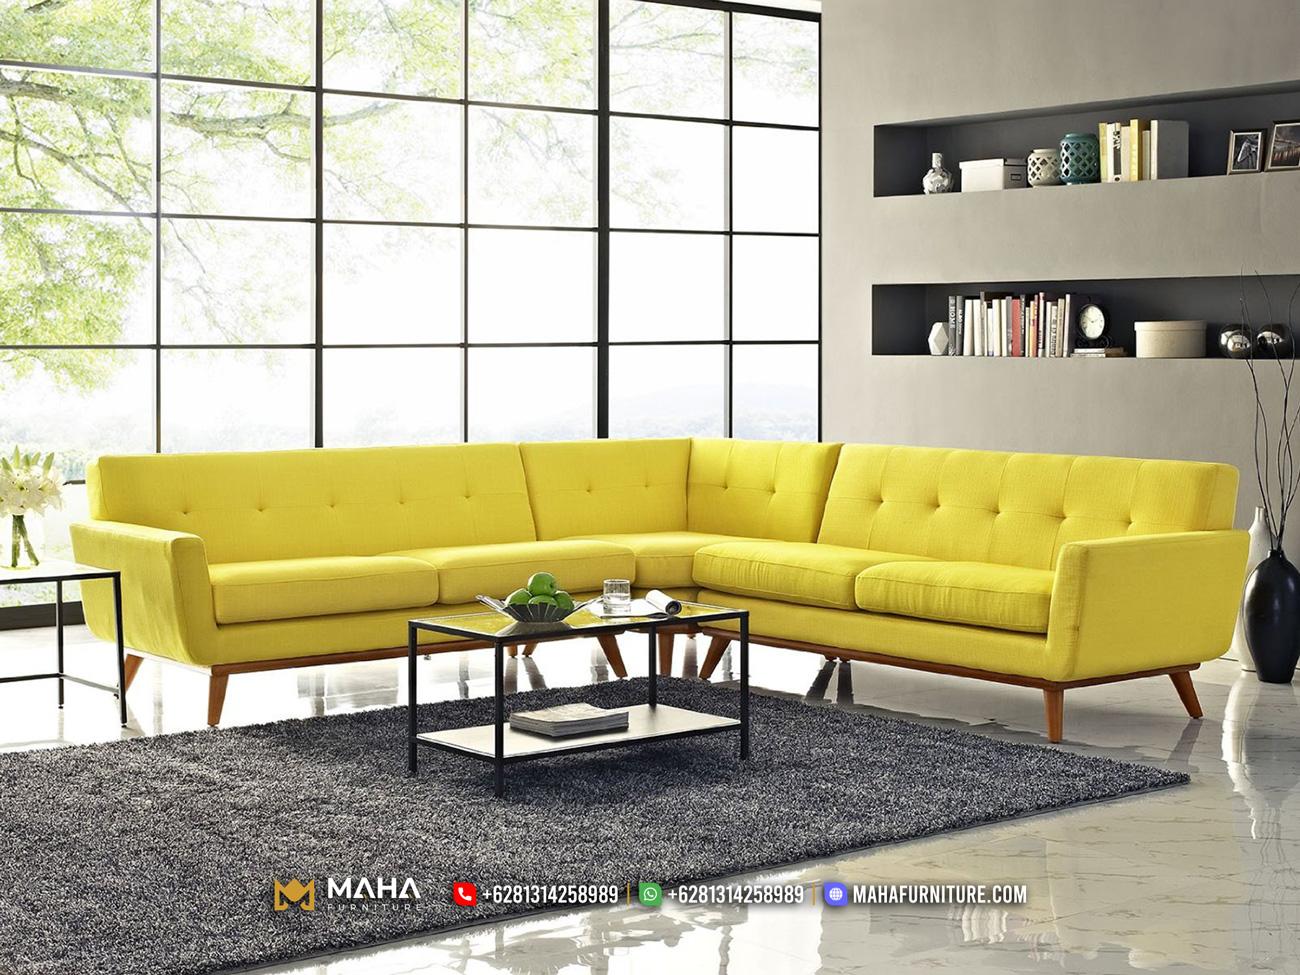 Terbaru Sofa Minimalis Jati Jepara Retro Minimalis Elegant MF248